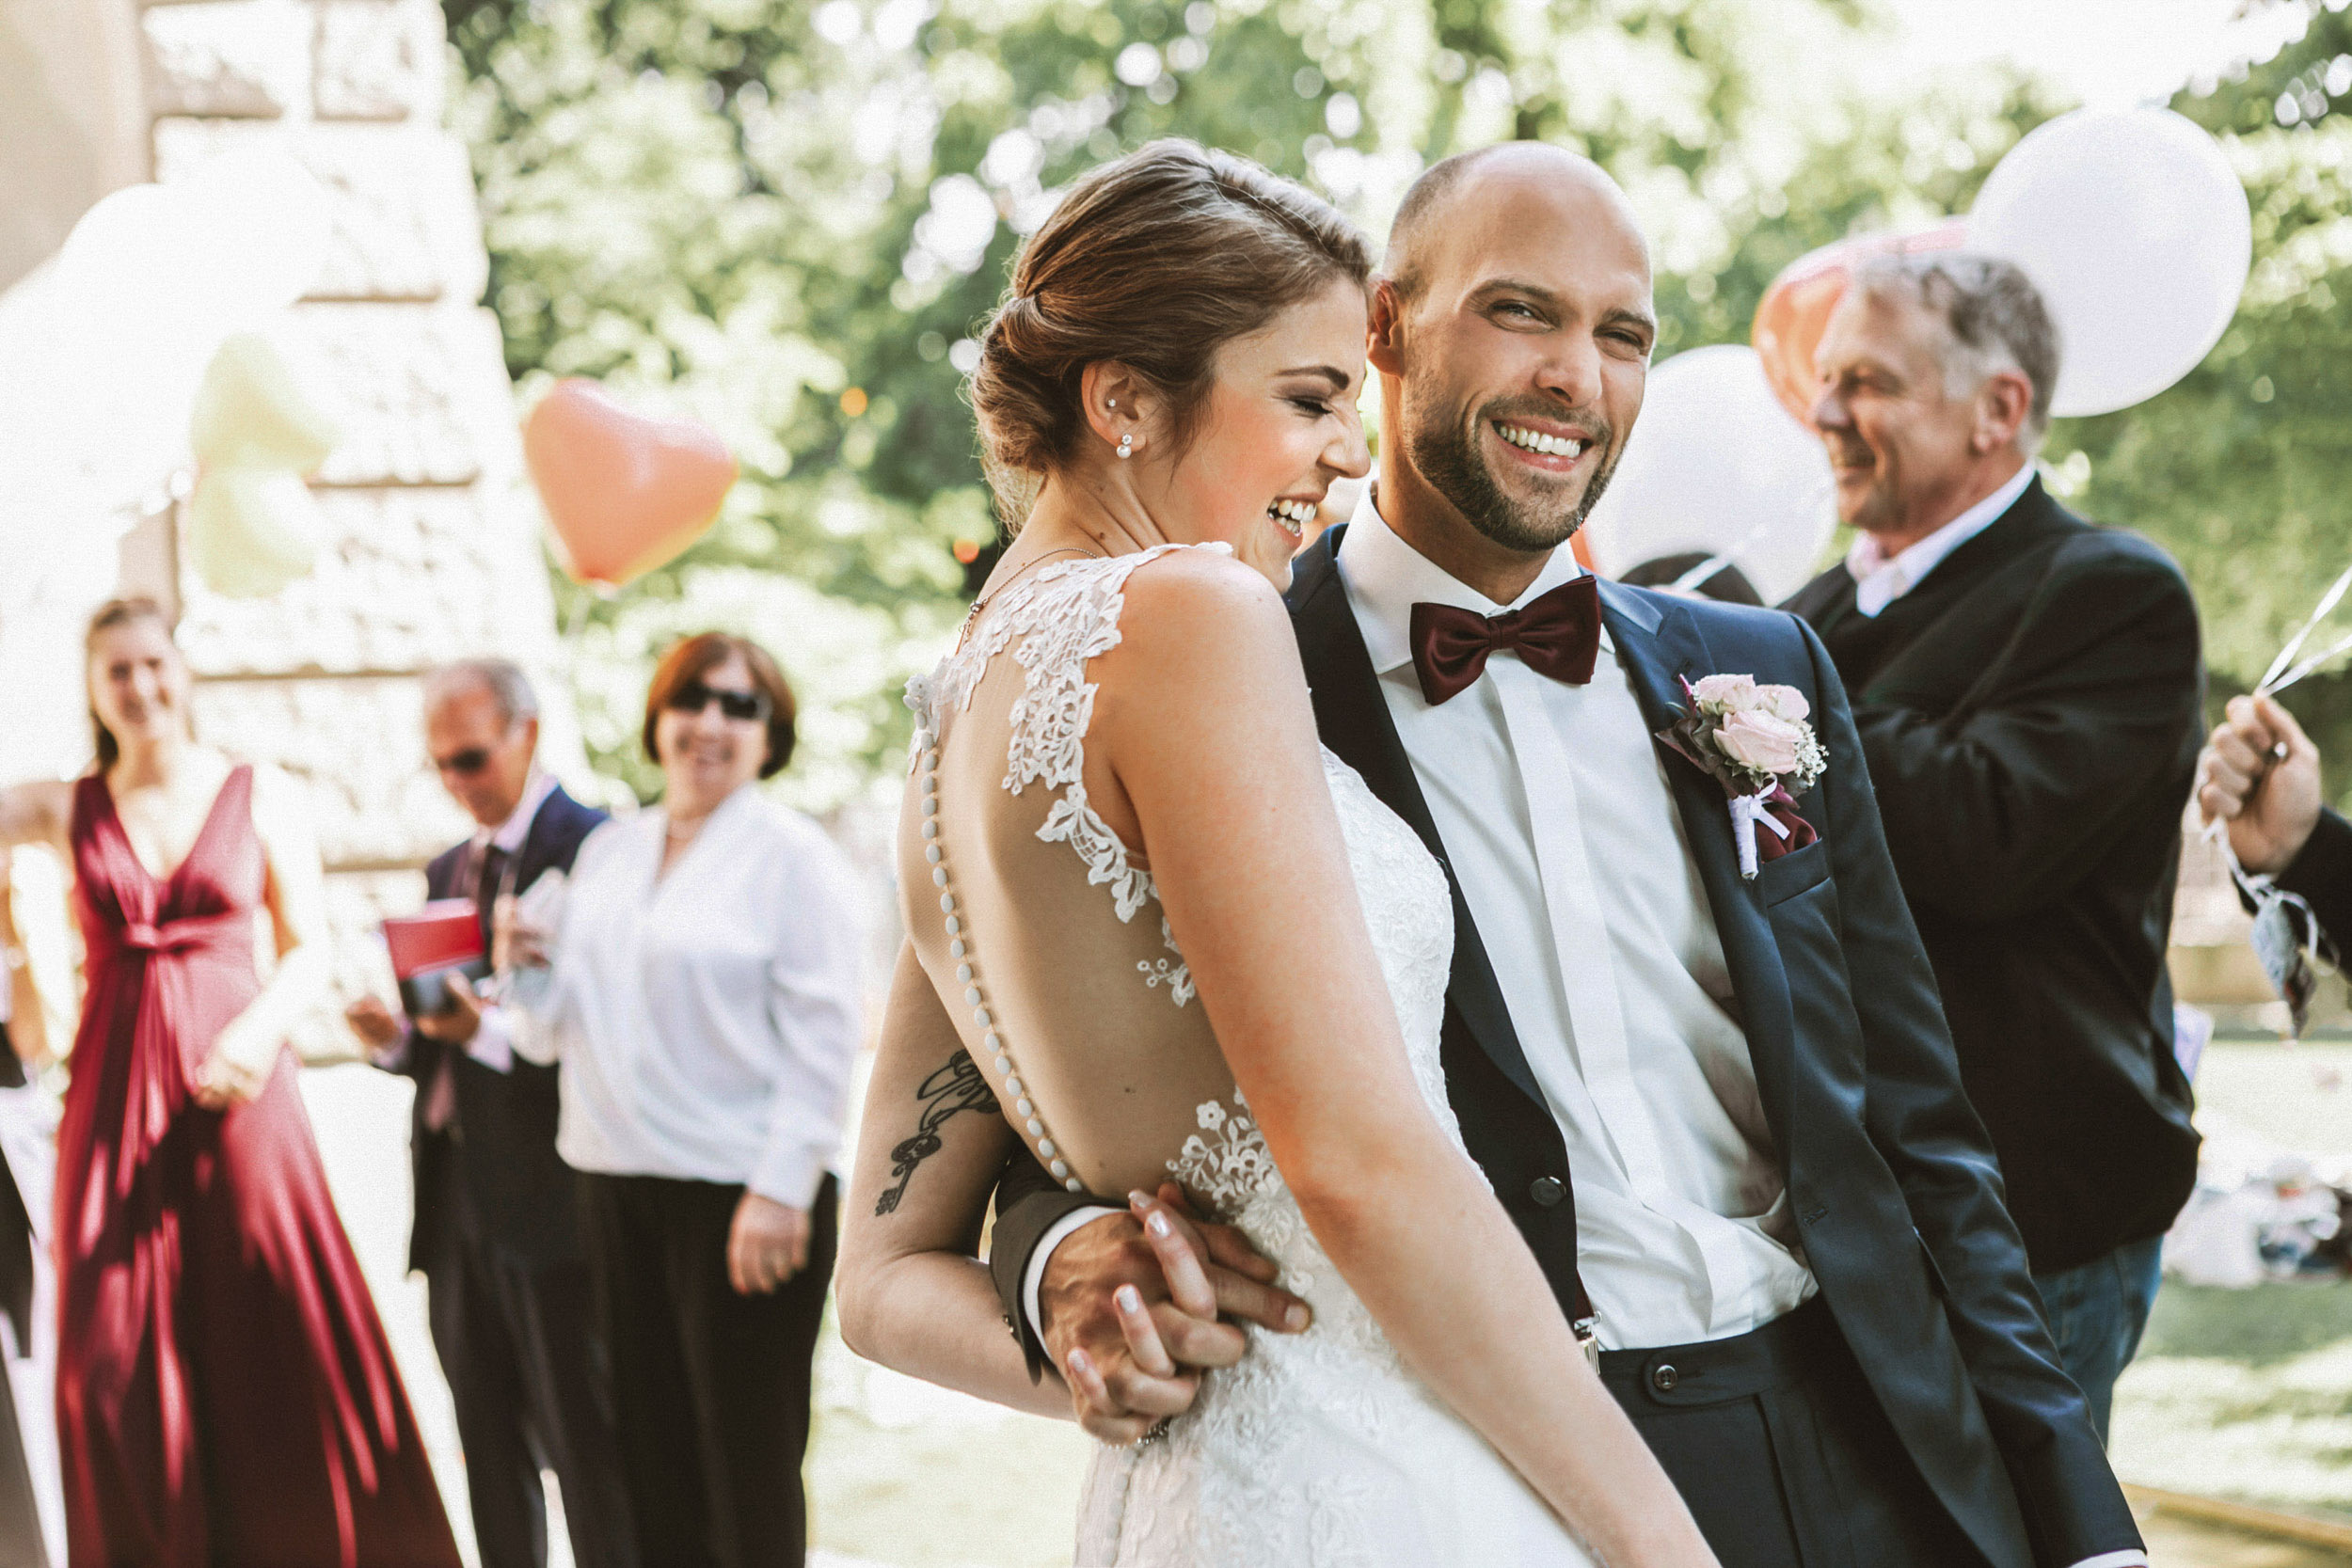 hochzeitsfotografie-schweiz_wedding-photographer-switzerland-europe_Bendik-Photography-007